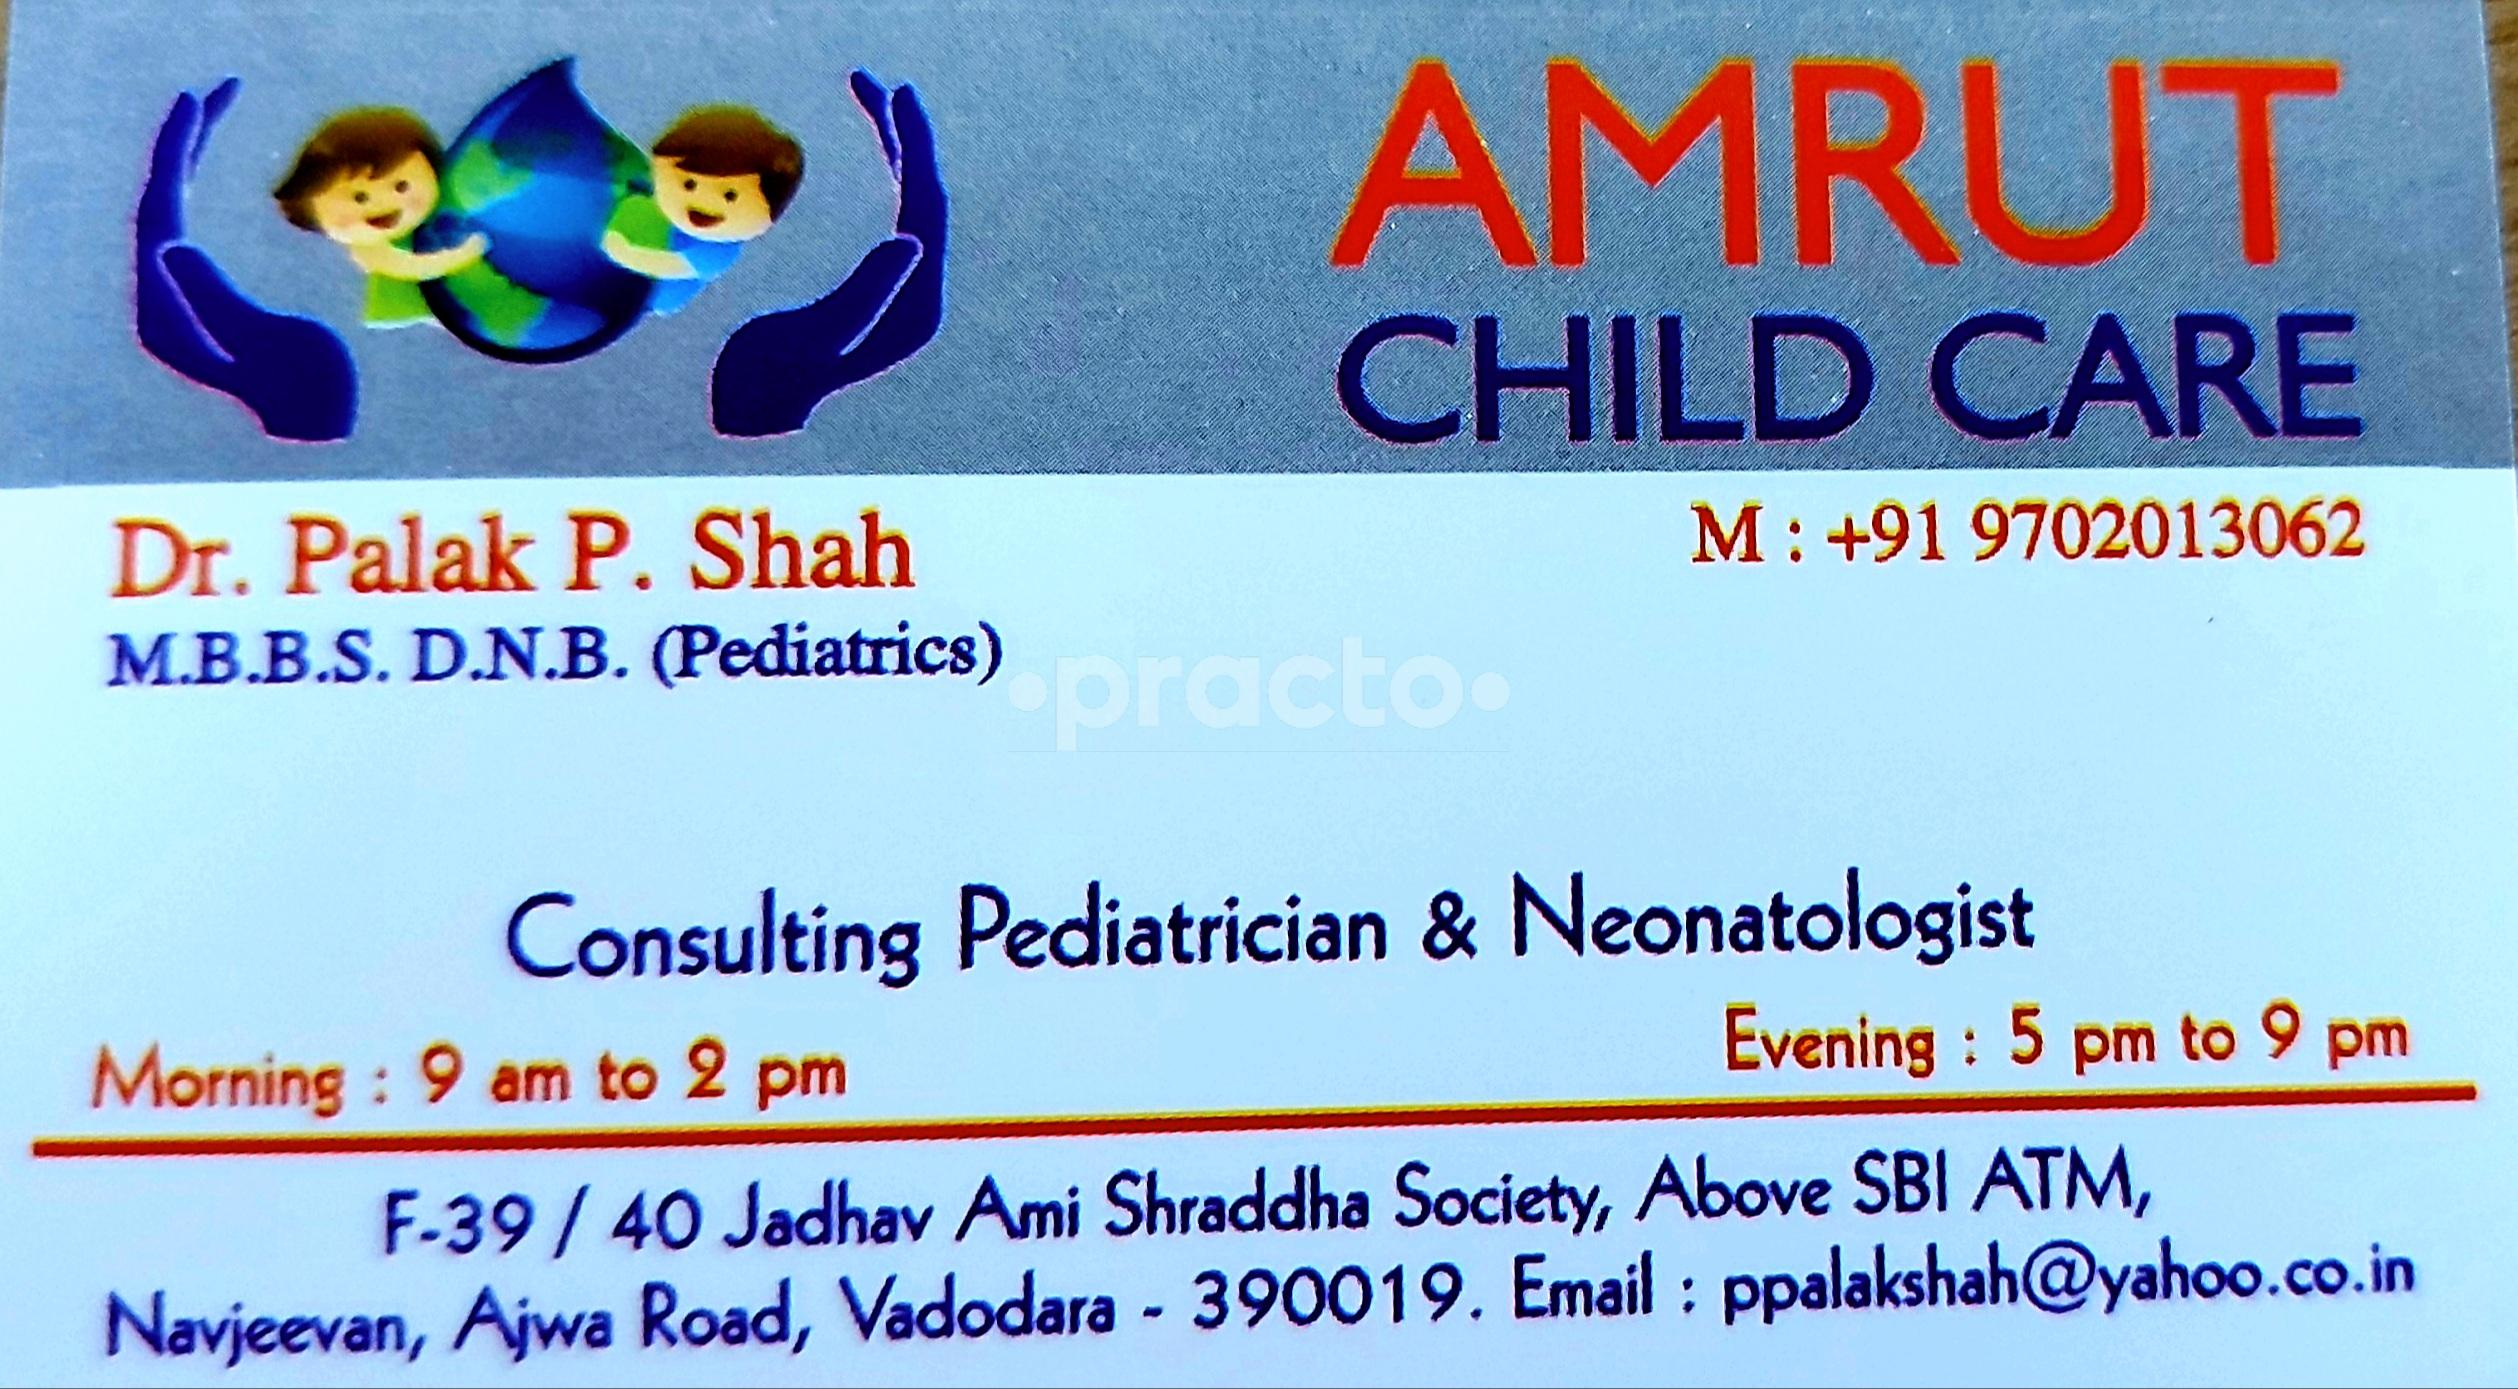 Amrut Child Care